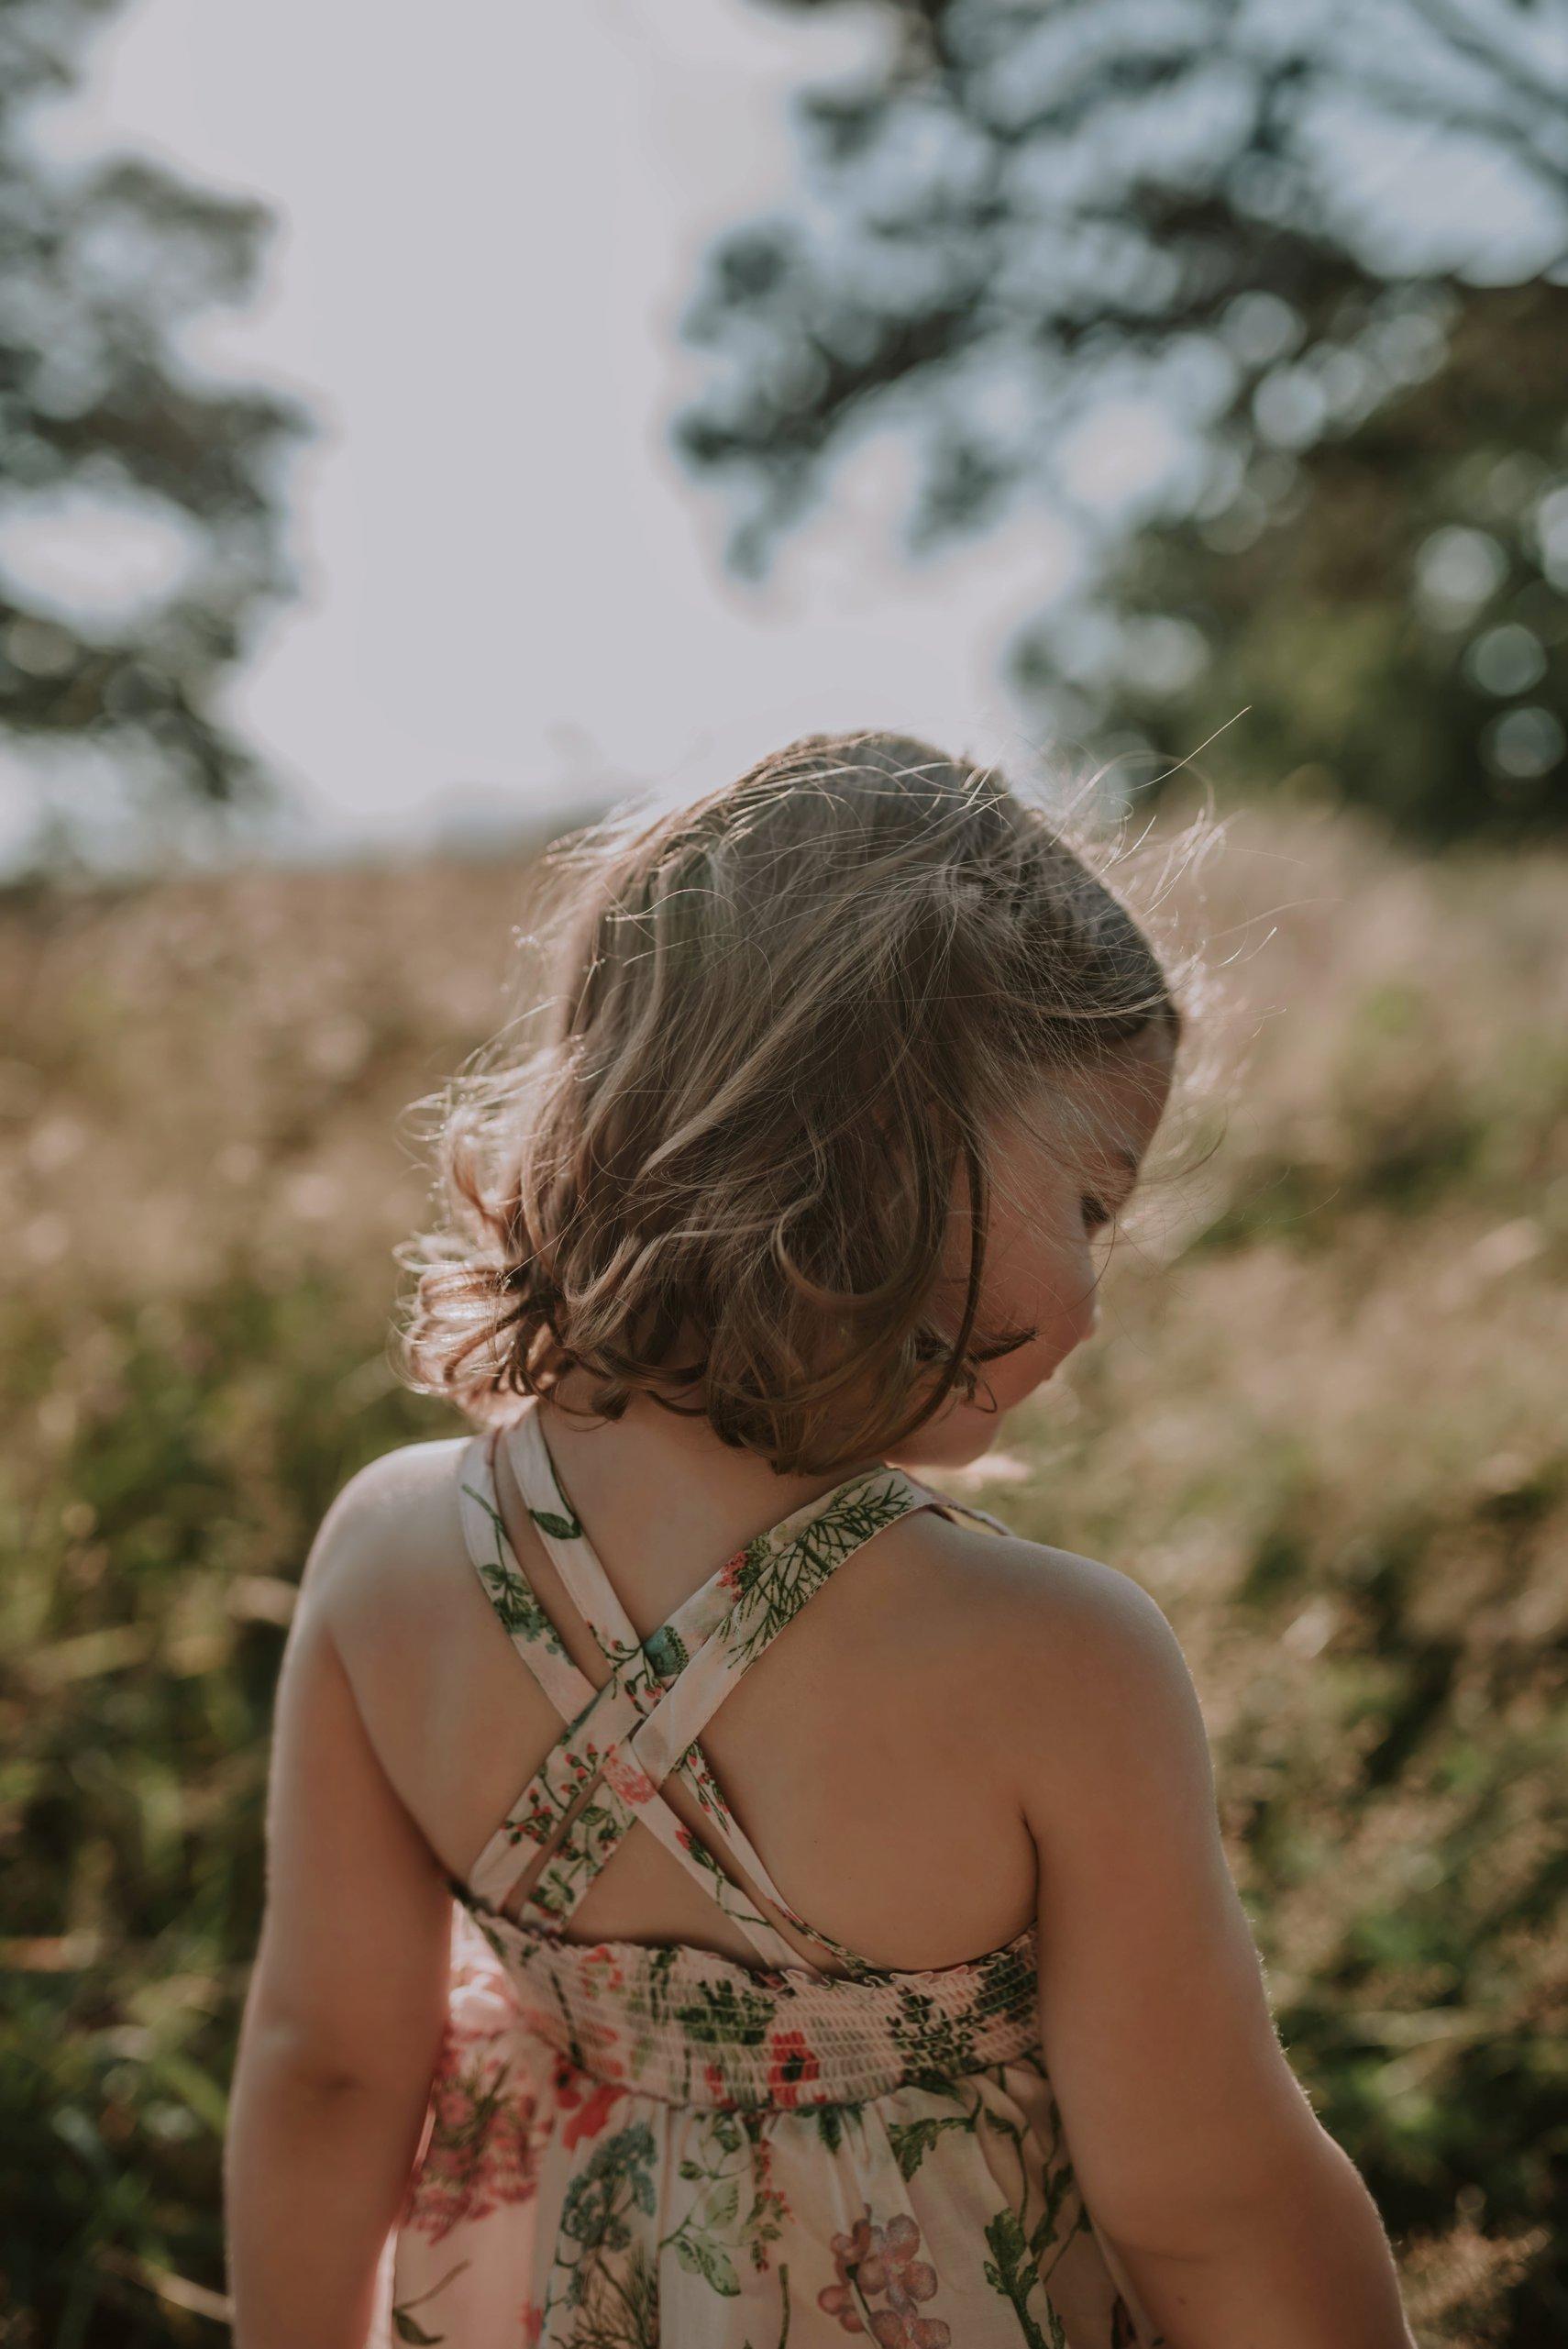 Summers_August_2018-51_Beautiful_Natural_Portraits_by_Award_Winning_Boston_Massachusetts_Family_Portrait_Photographer_Asher_and_Oak_Photography.jpg